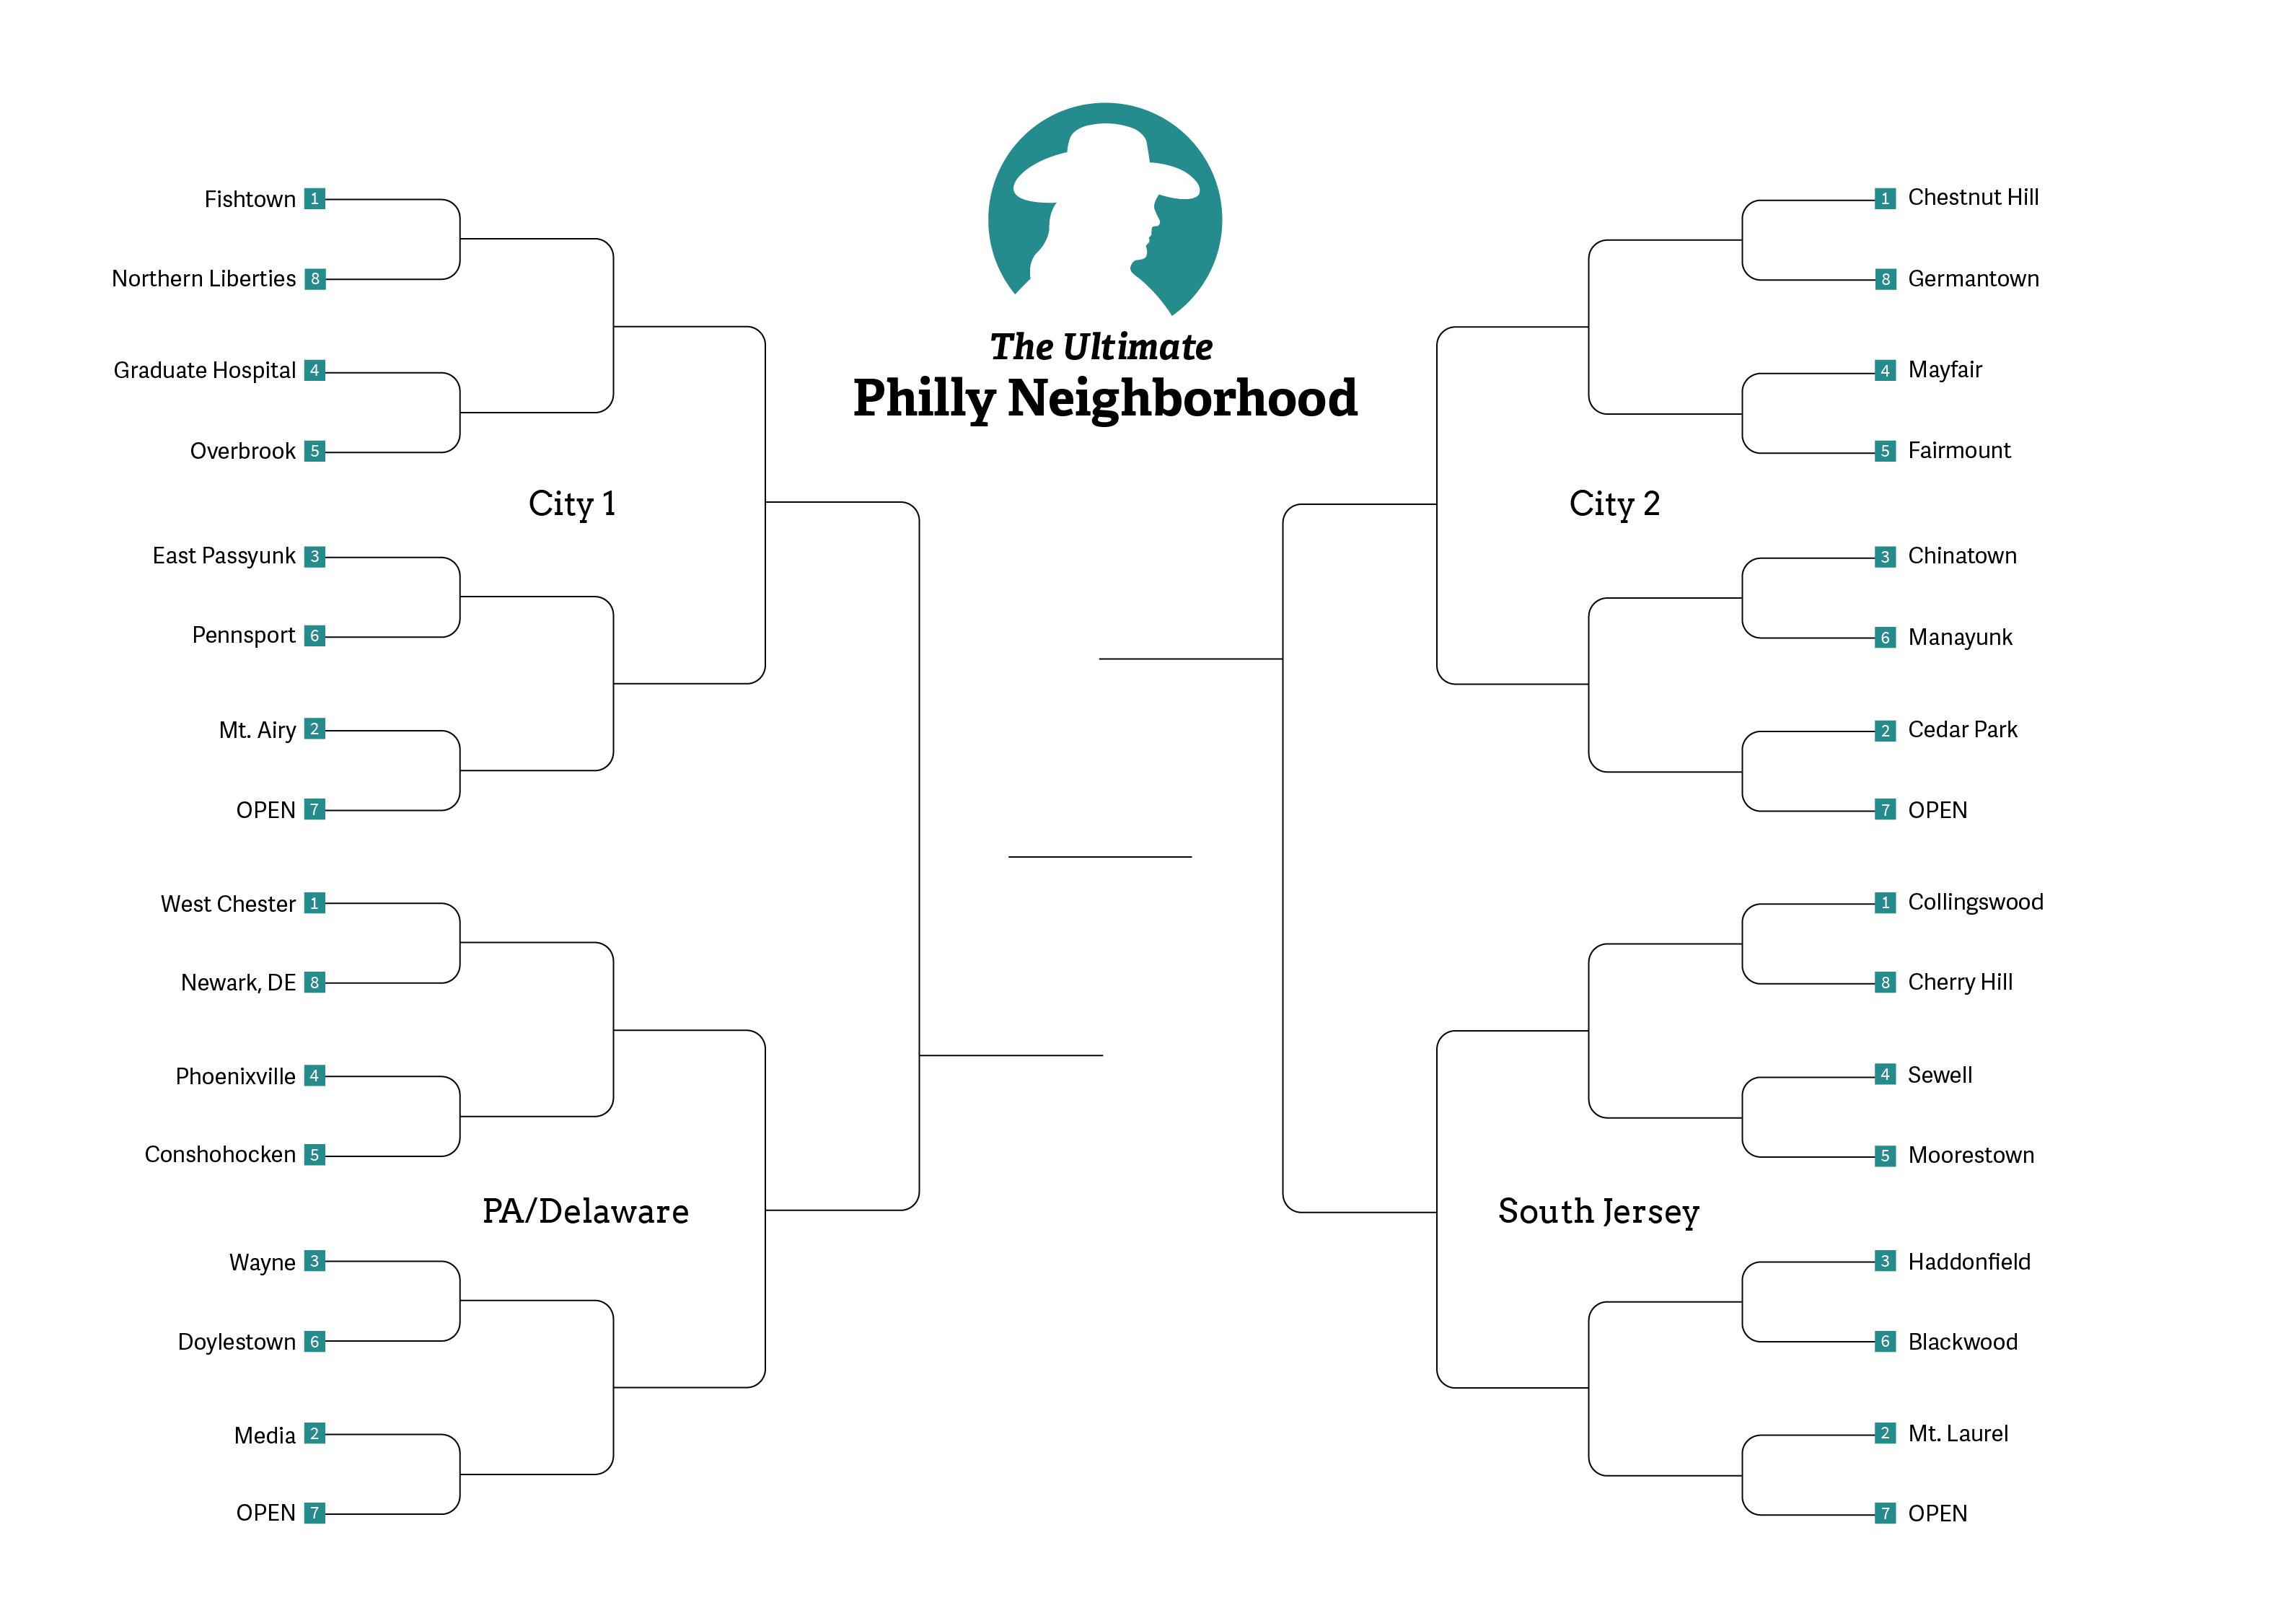 philly_neighborhood_32